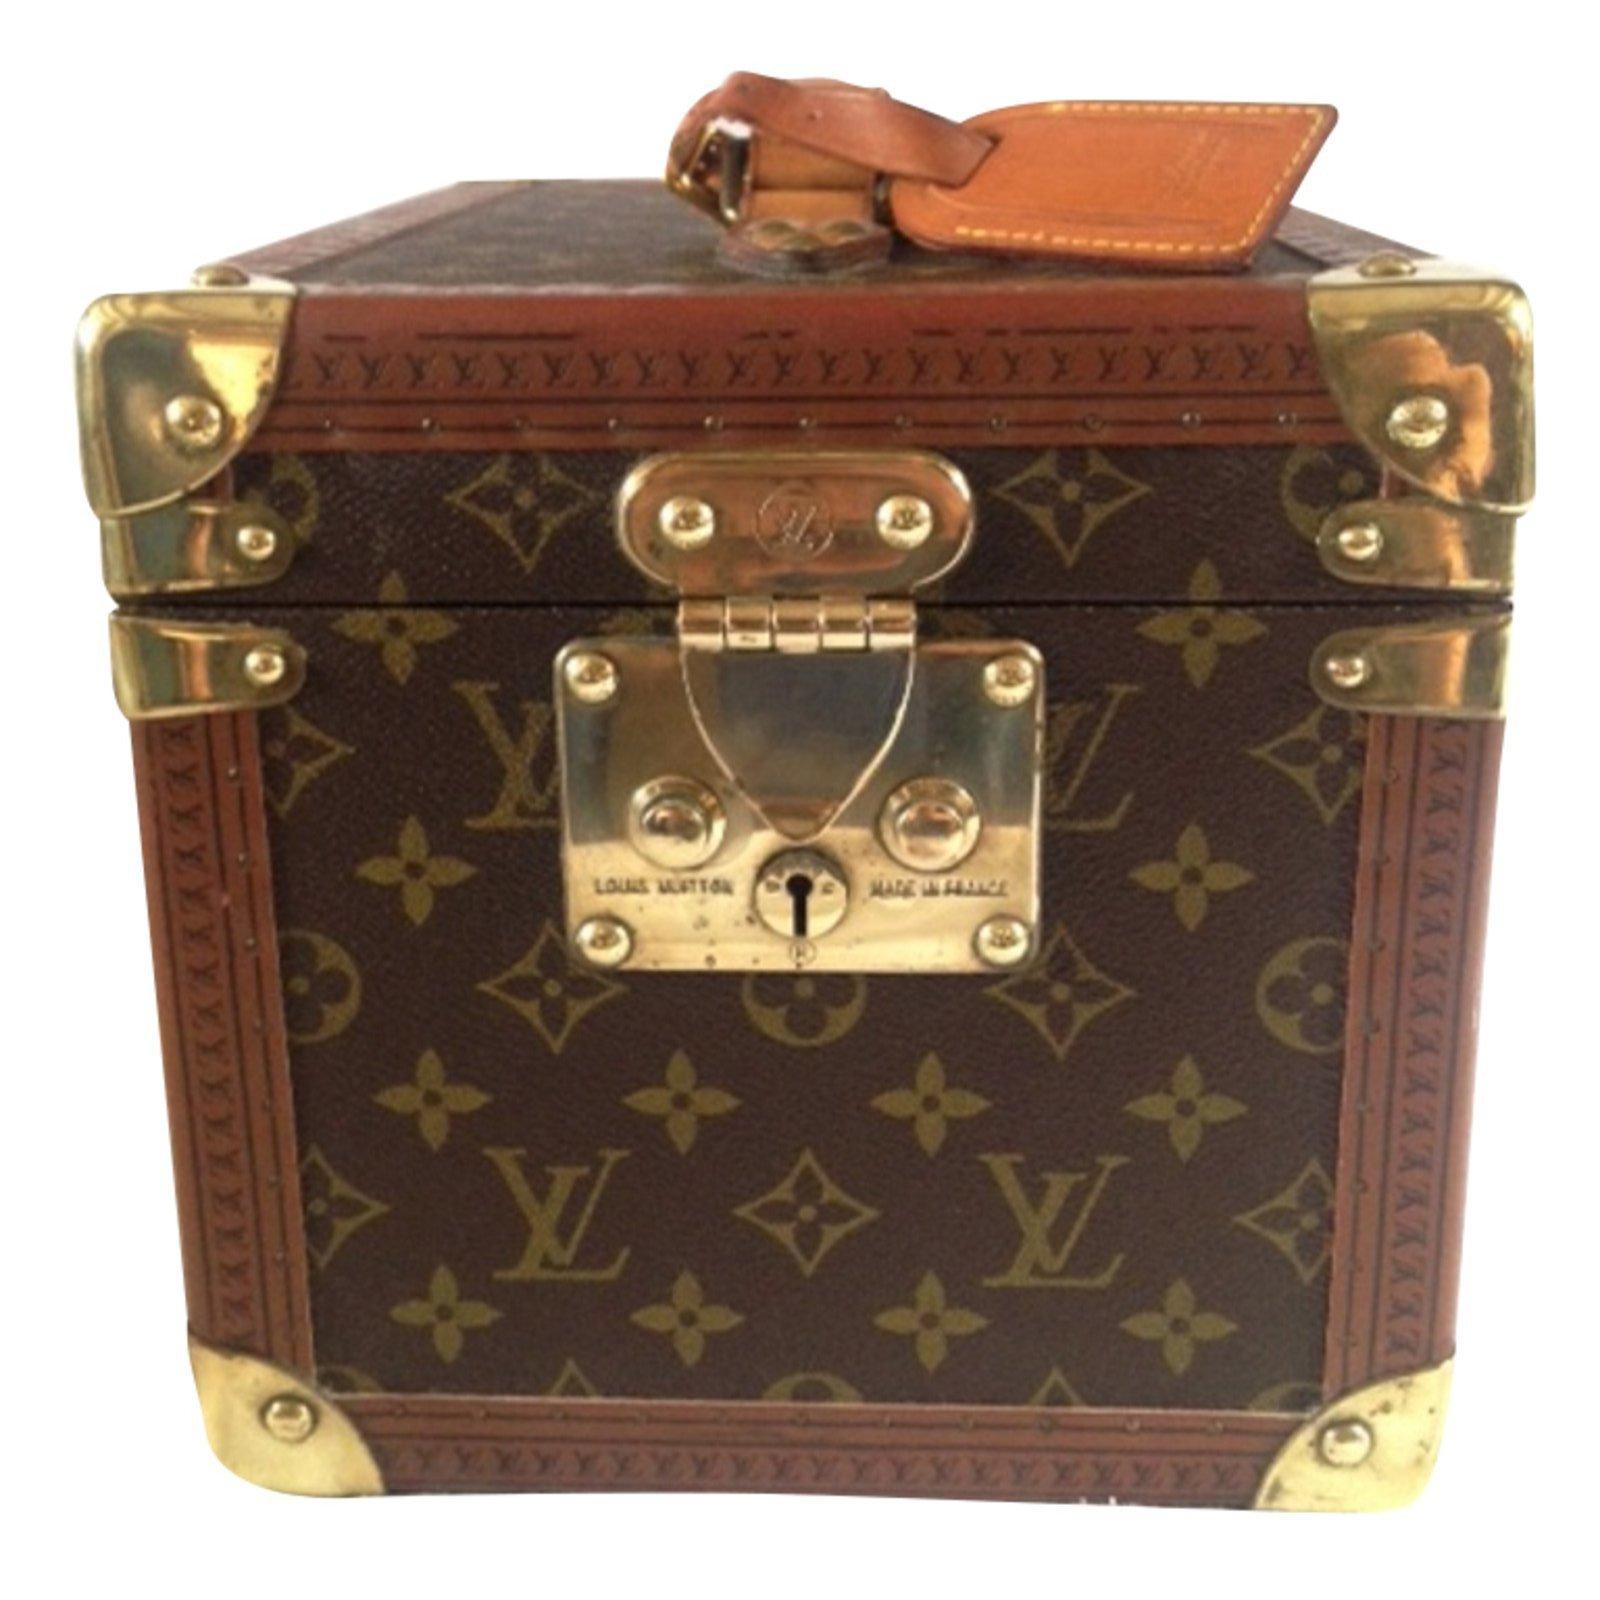 75e901743af Louis Vuitton Vanity-case Travel bag Leather,Cloth Brown ref.42279 ...